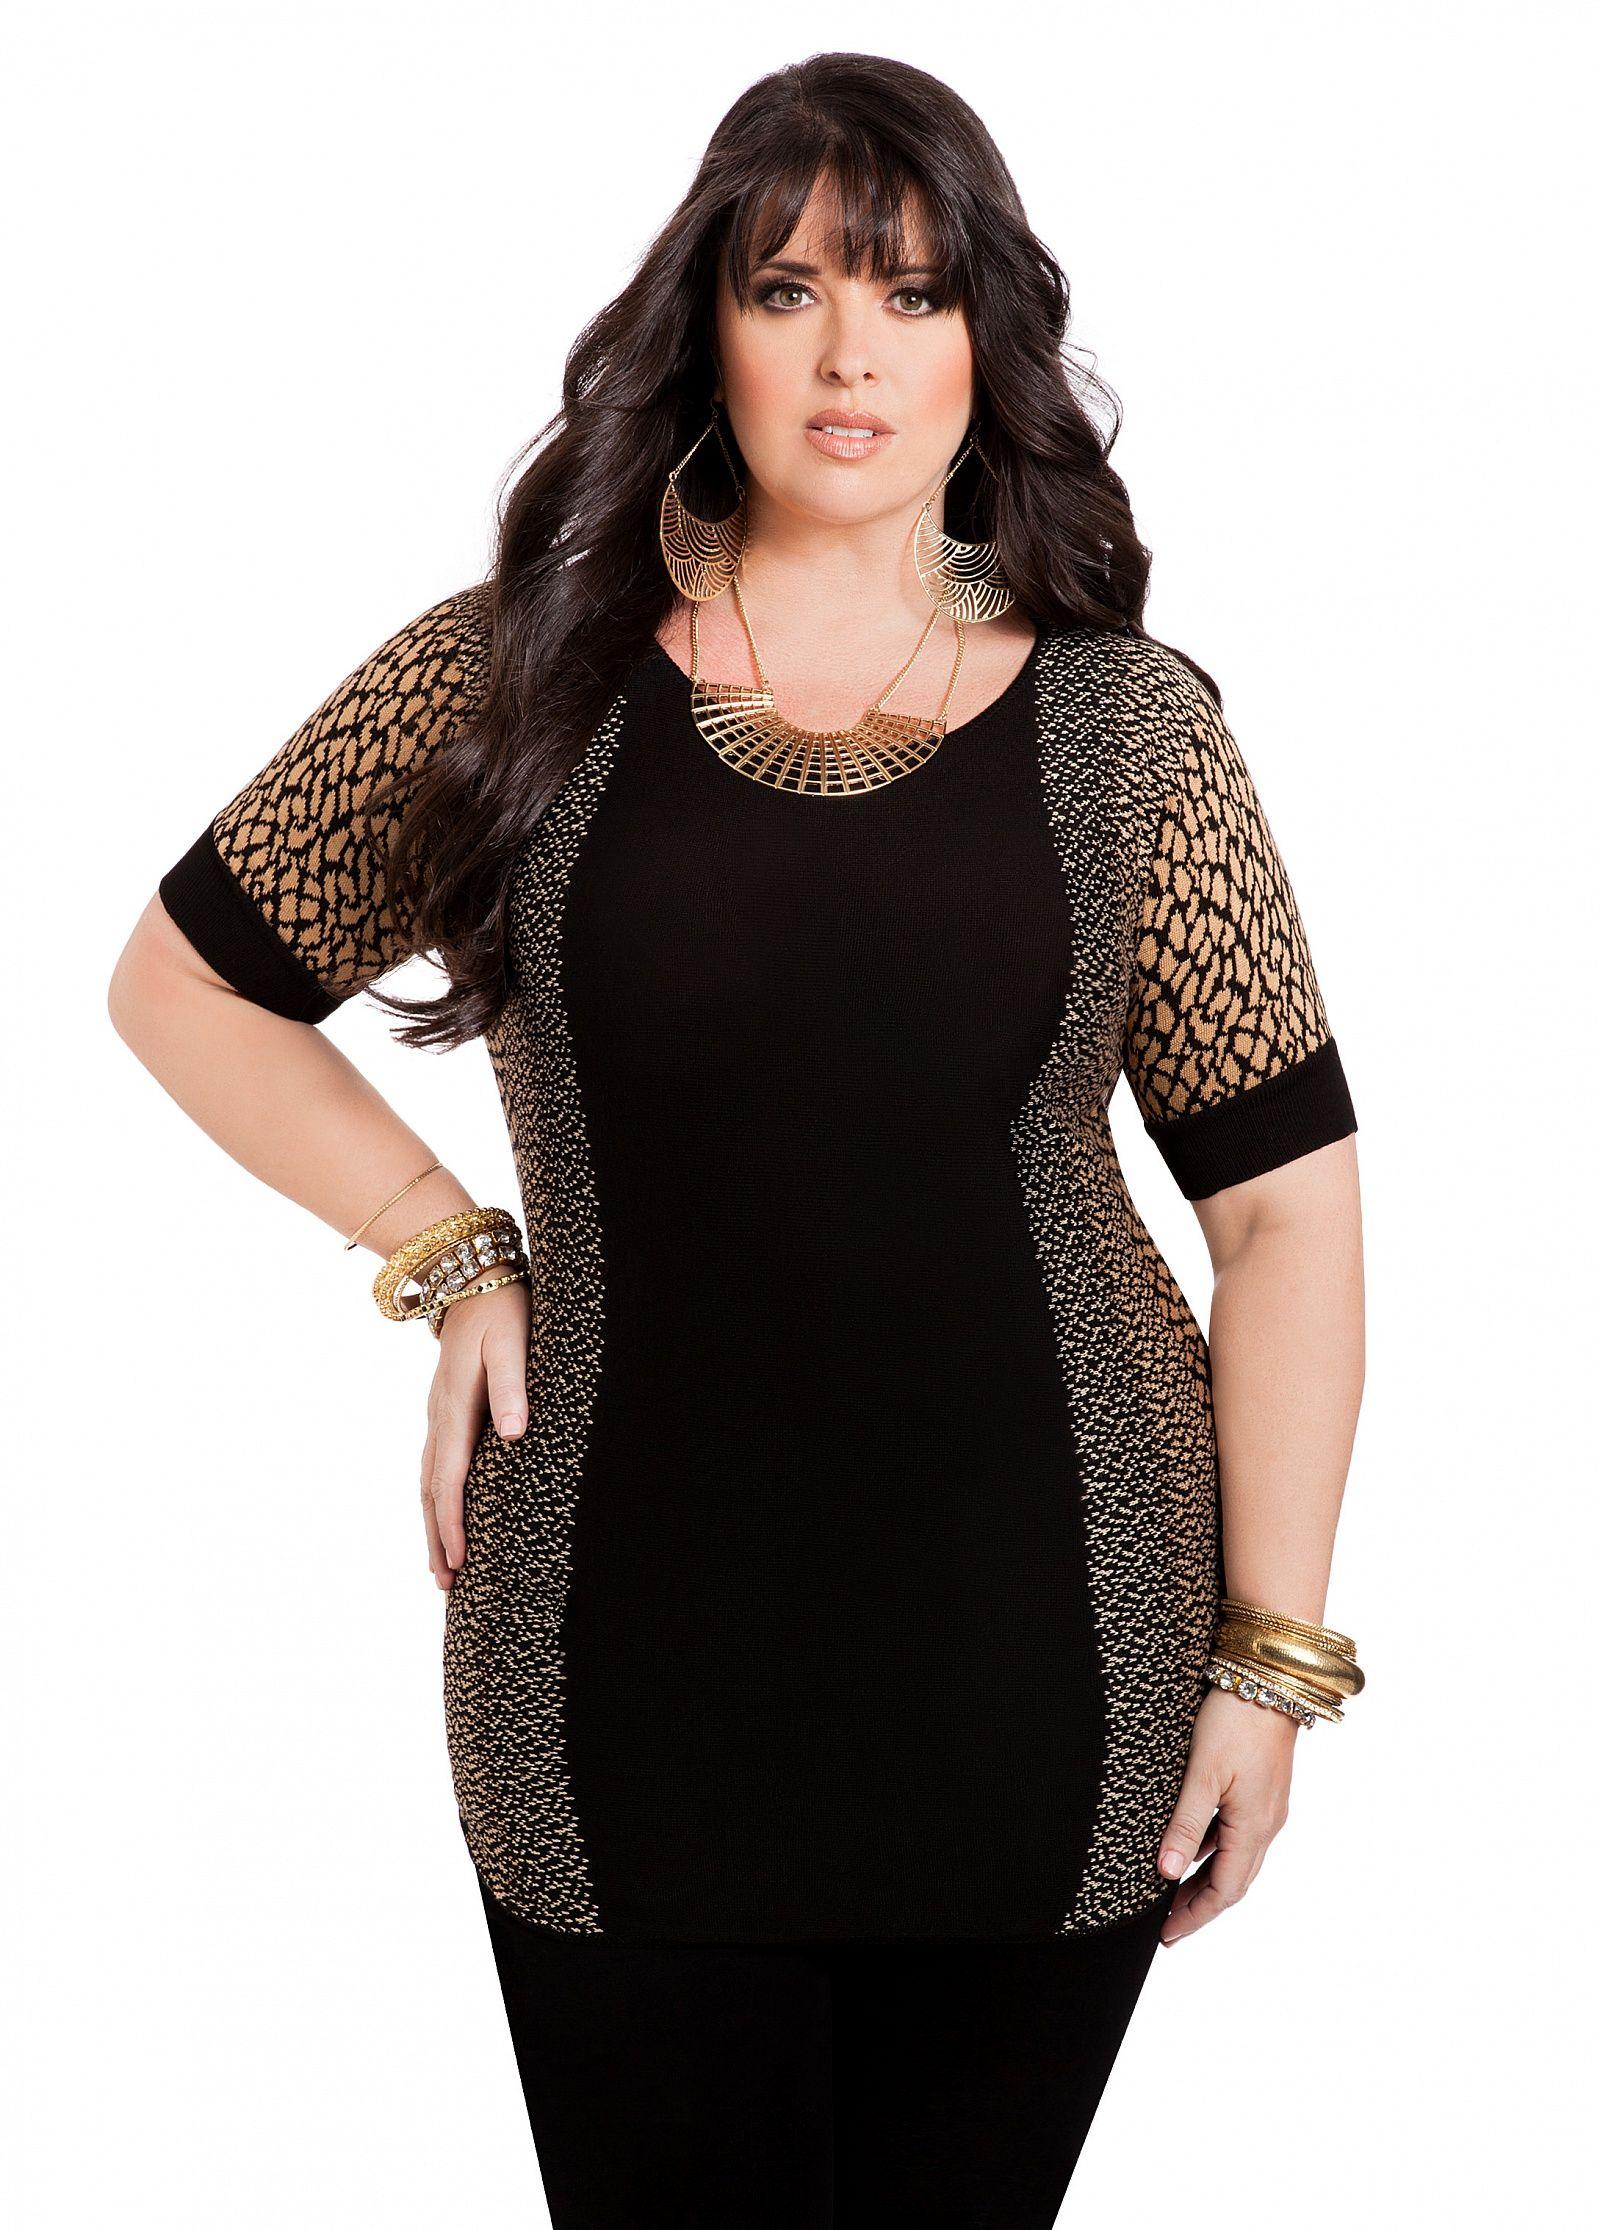 d3b204473ceb1 Ashley Stewart  Animal Print Knit Top  UNIQUE WOMENS FASHION Evening  Dresses Plus Size